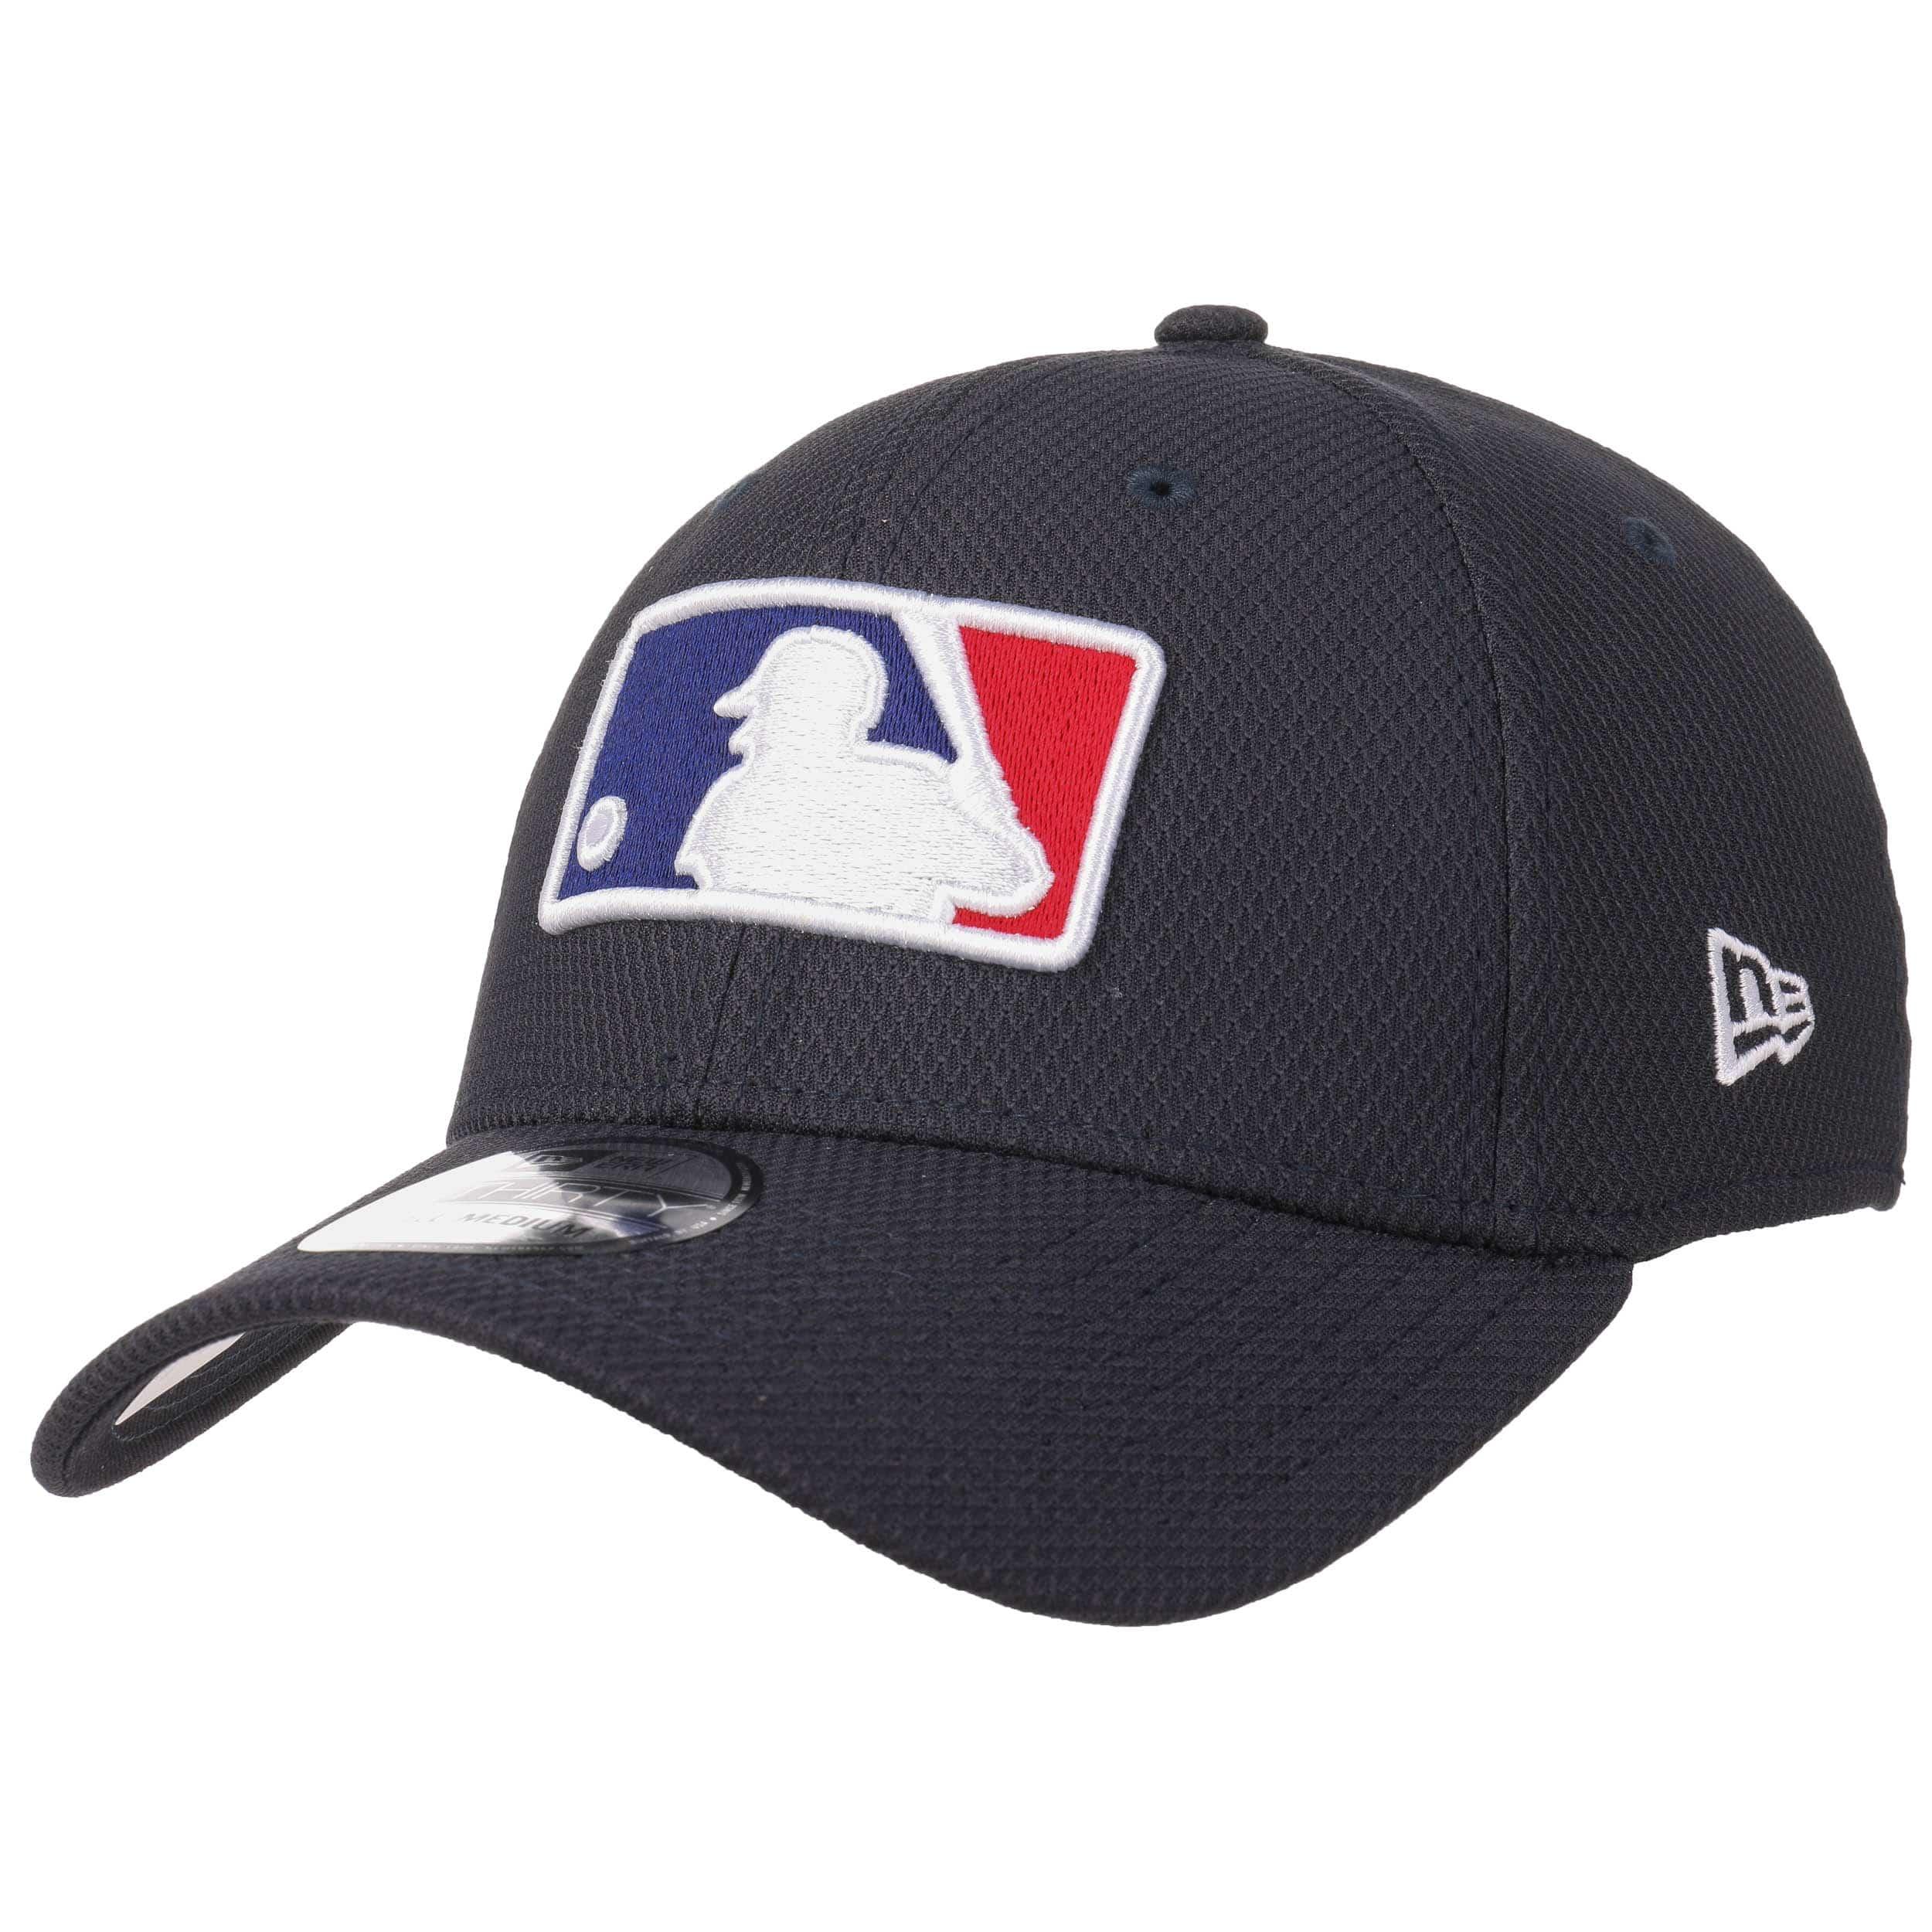 a790ddf05d393 Gorra 39Thirty League MLB by New Era - Gorras - sombreroshop.es